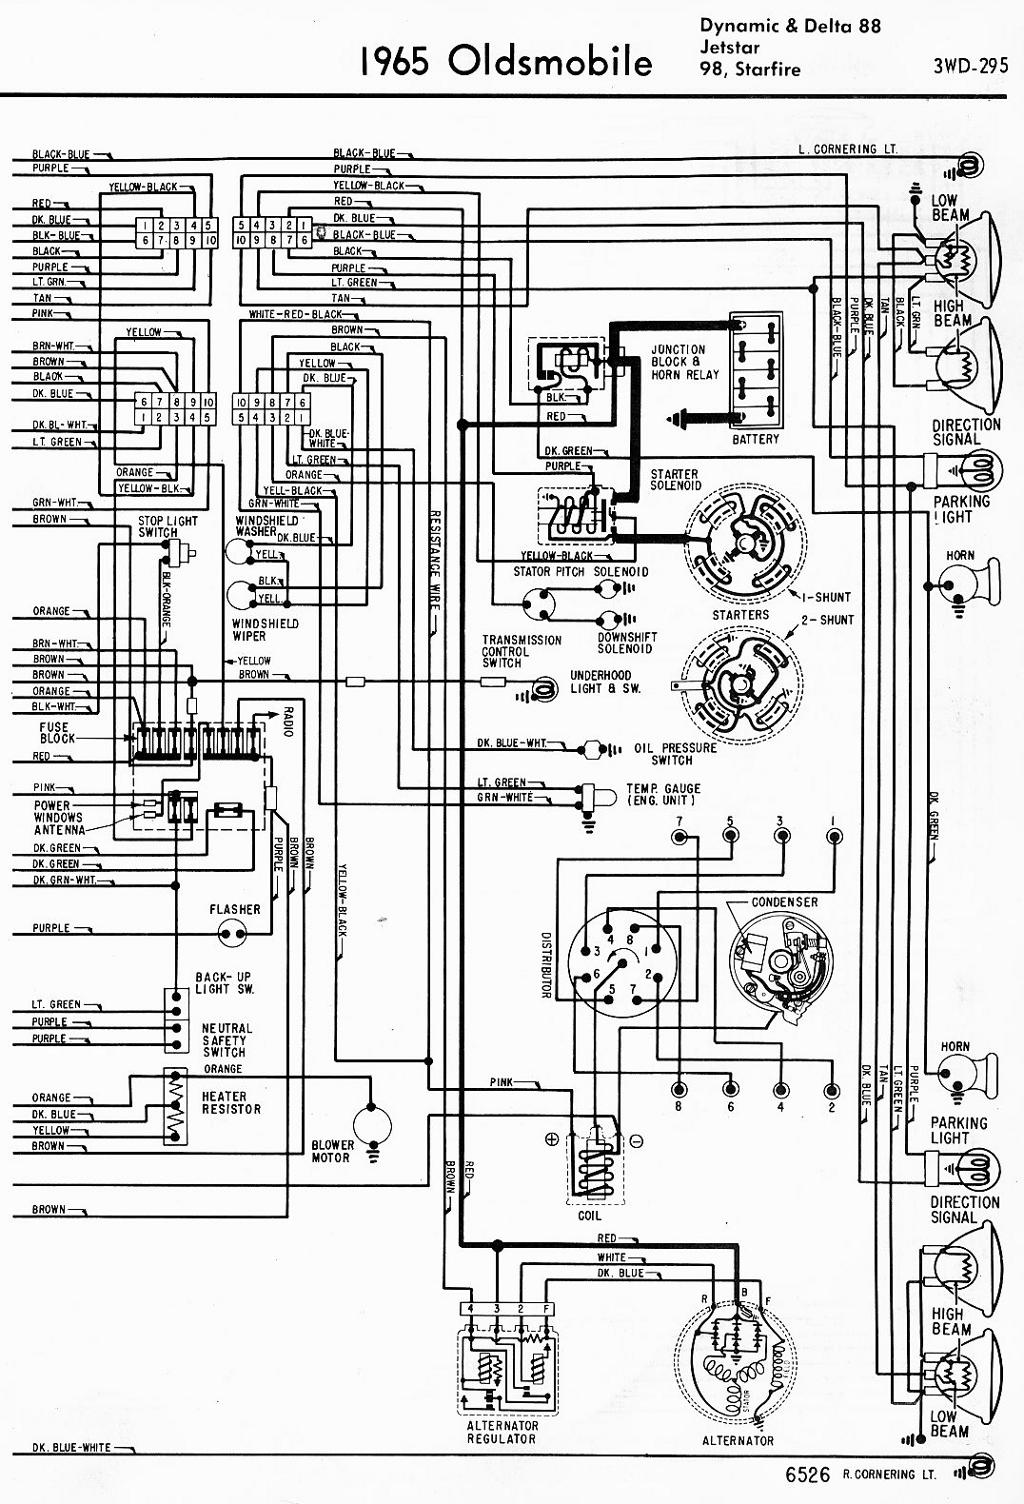 88 honda accord wiring diagram 1955 chevrolet truck for a 1966 dynamic classicoldsmobile